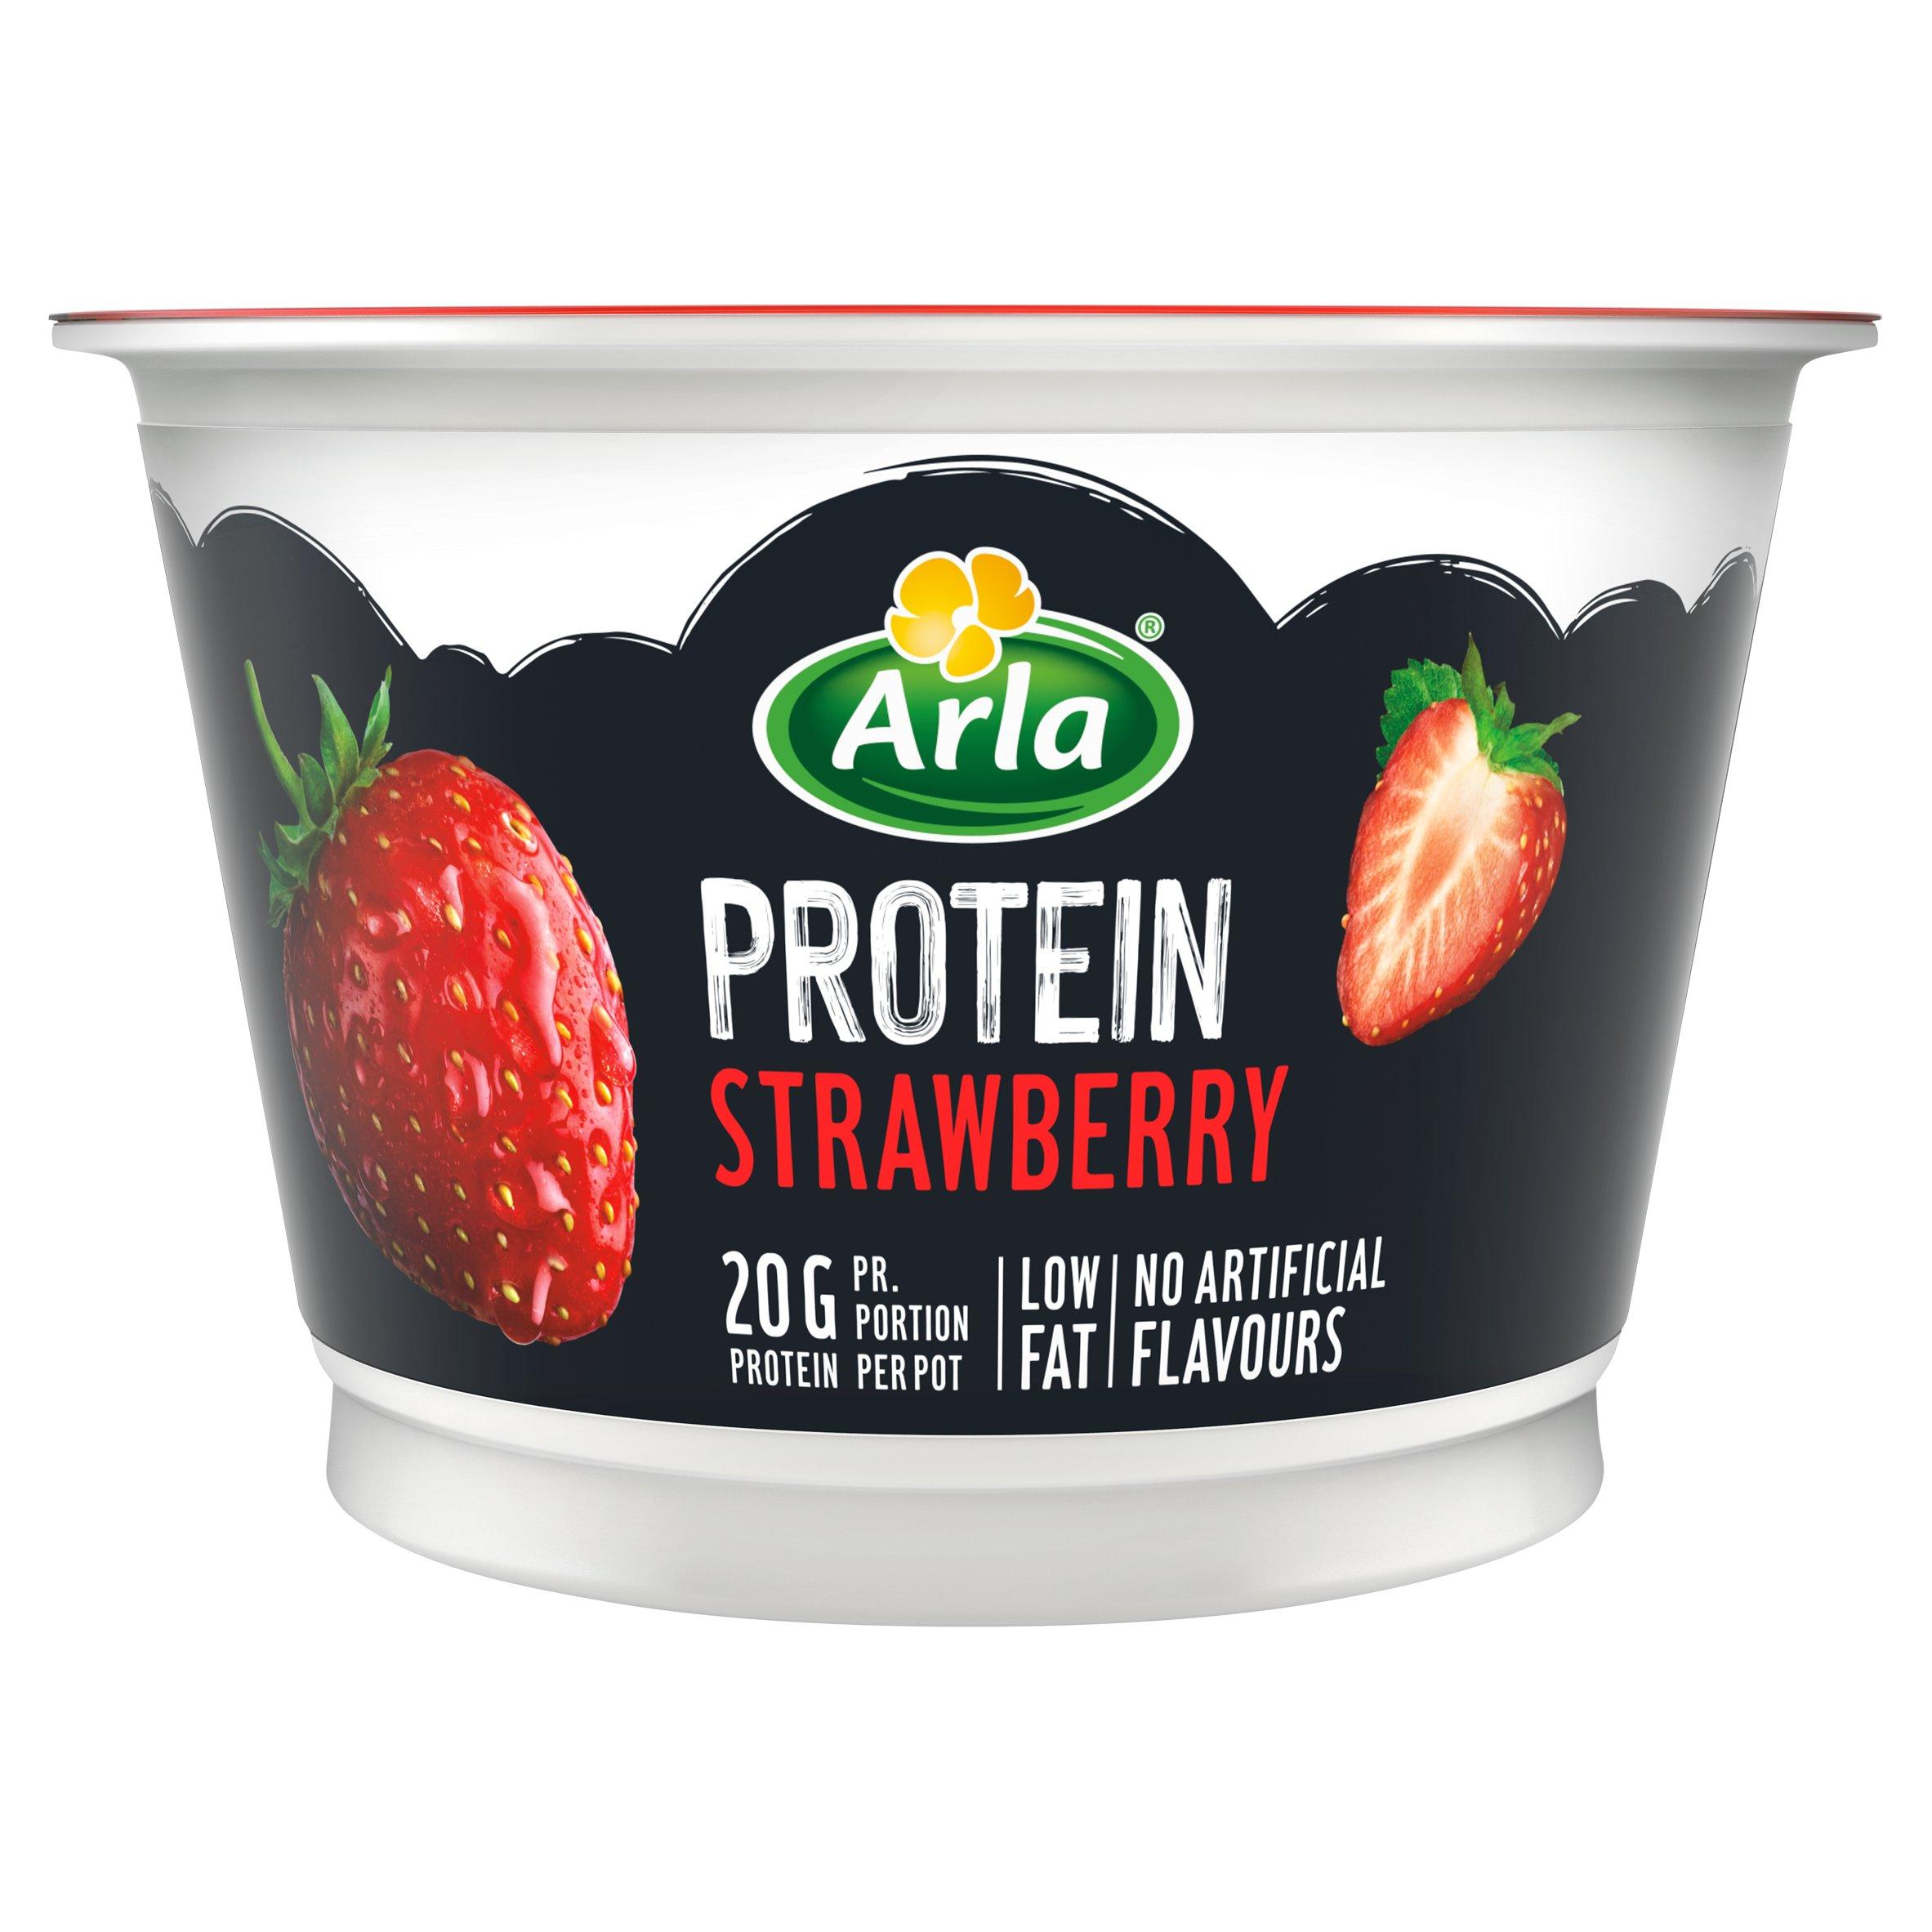 Arla Protein Strawberry 200G